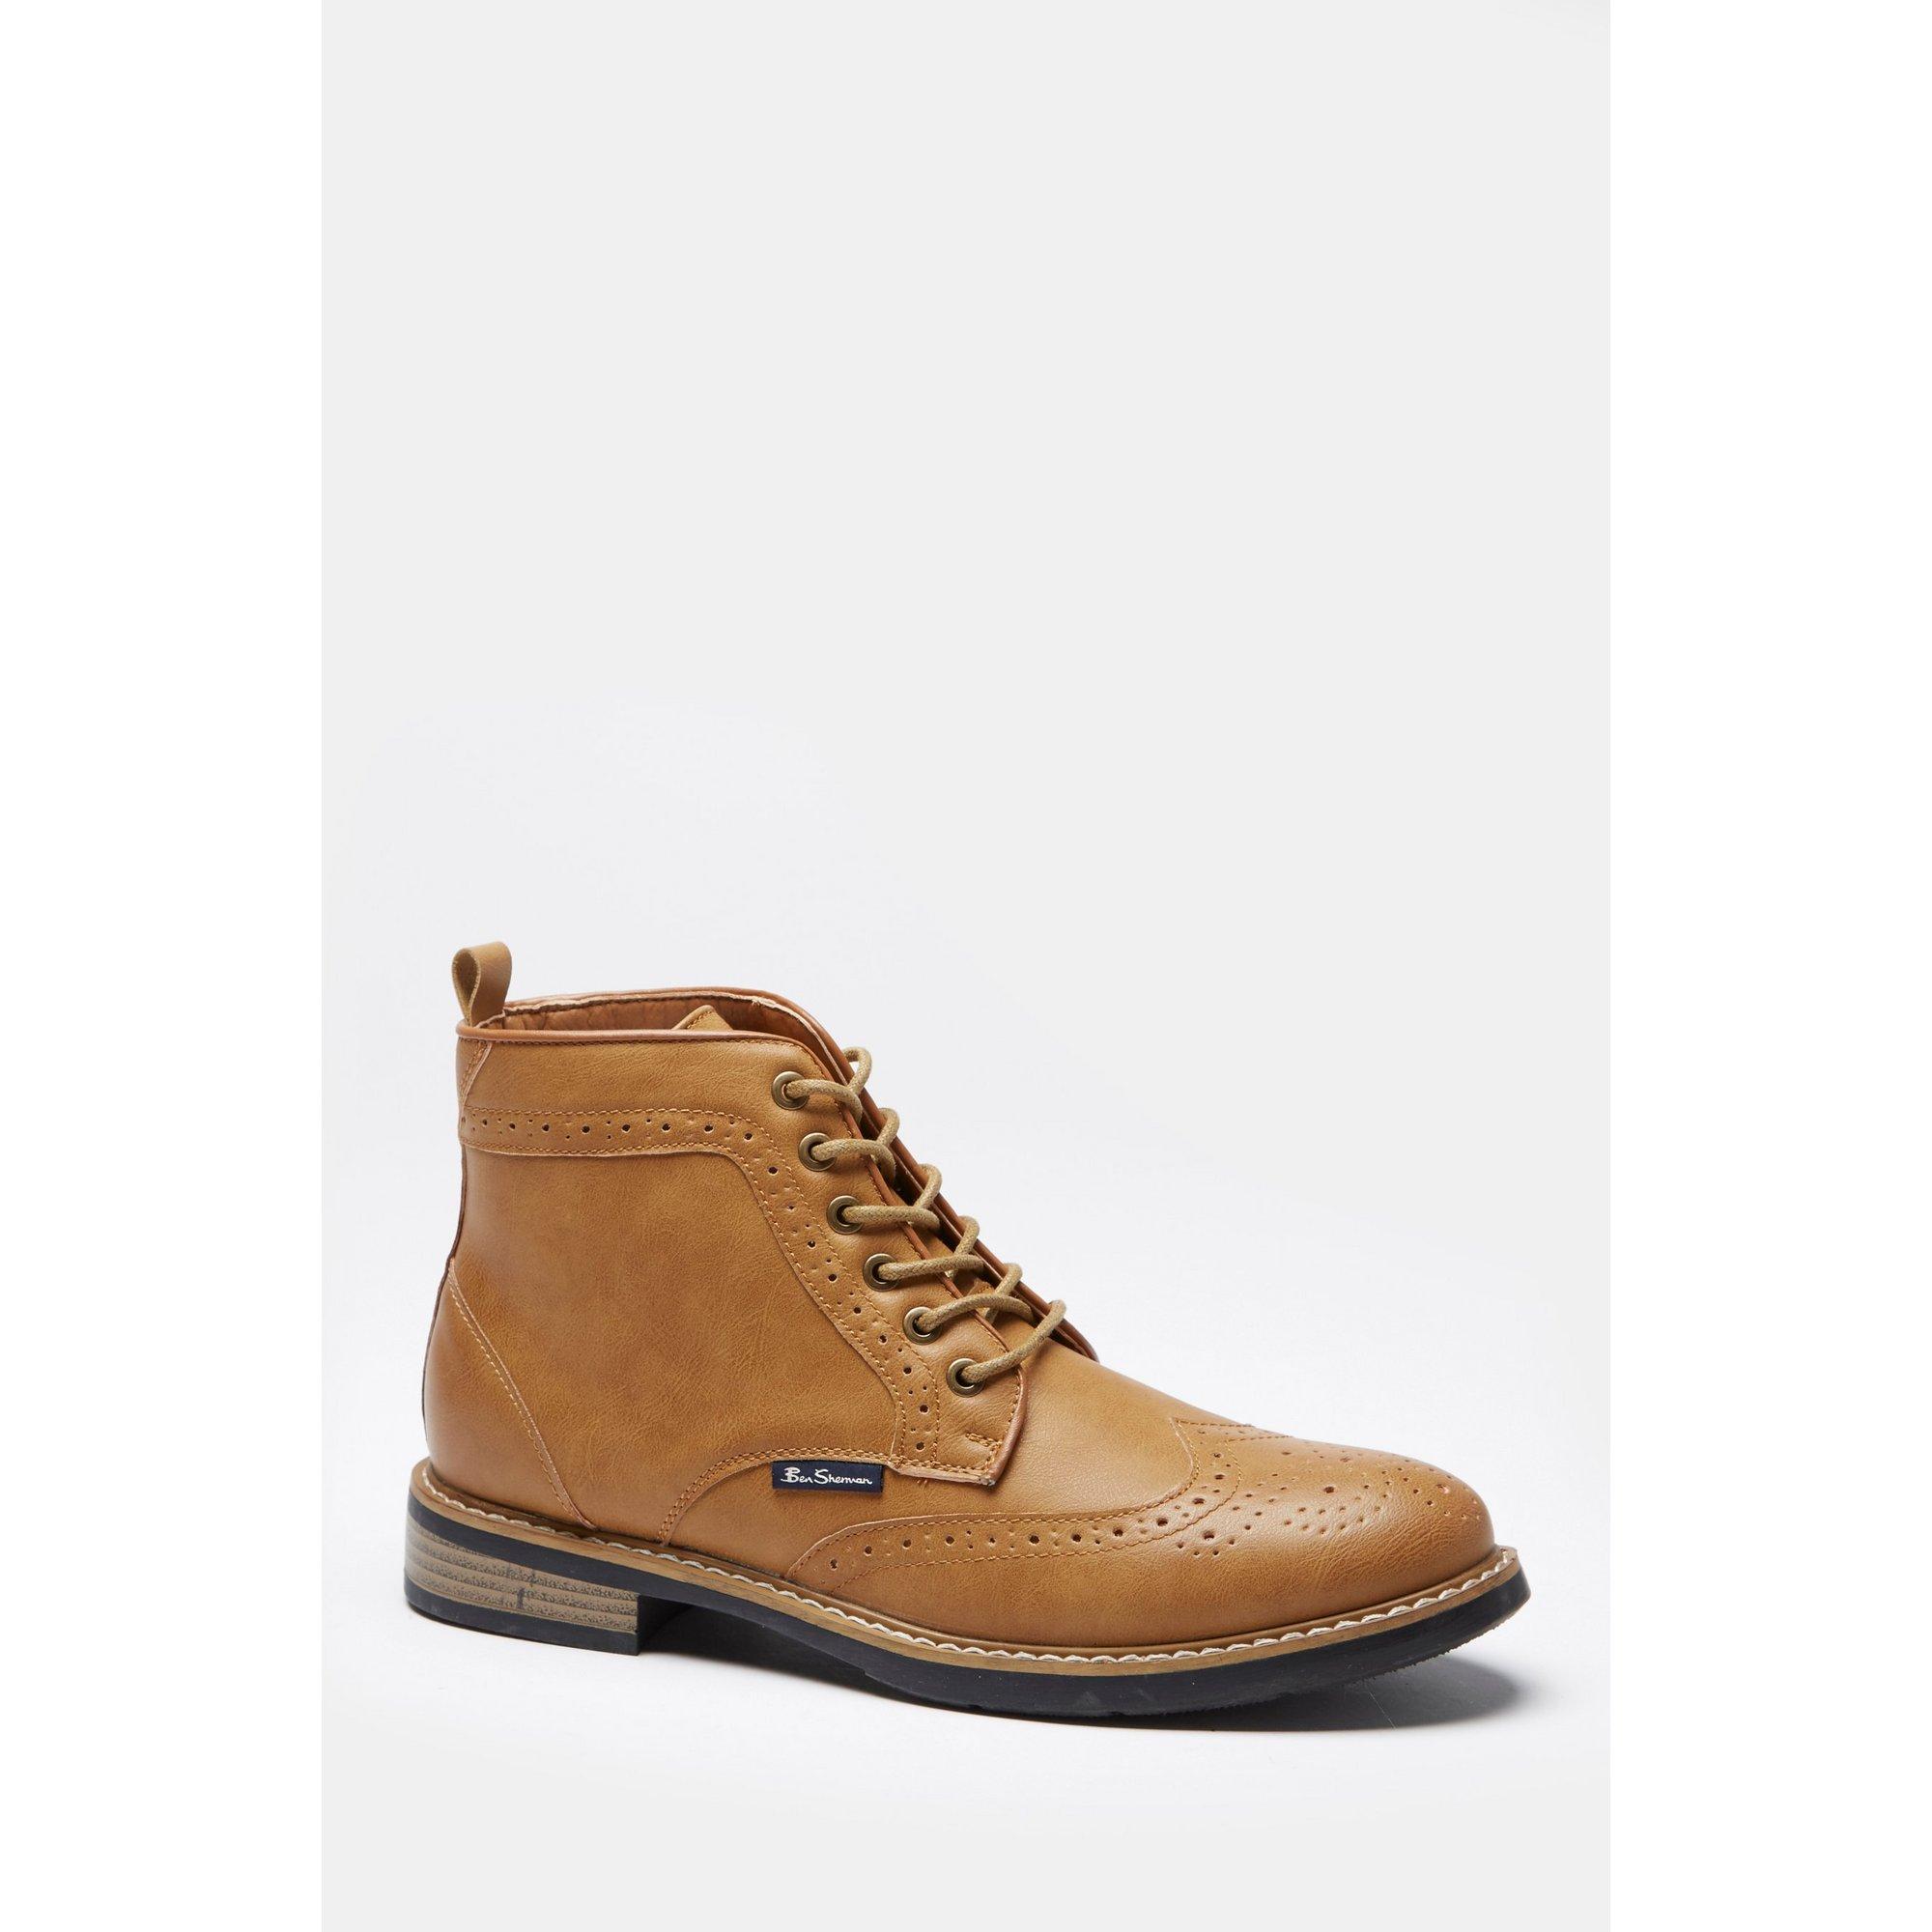 Image of Ben Sherman Templeton Brogue Boots